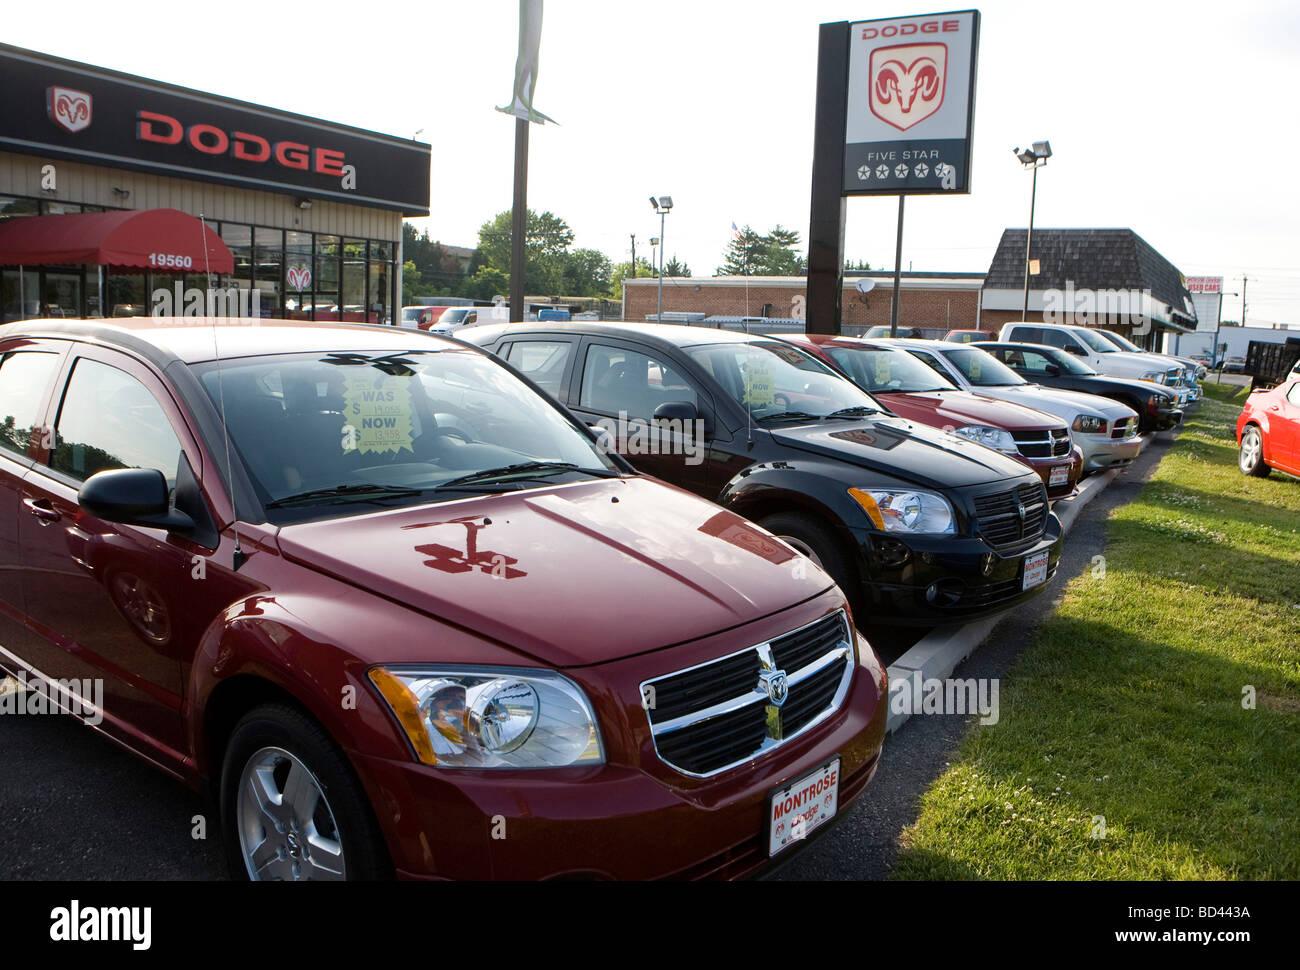 otoriyoce nj brunswick jeep com dodge east amazing dealership dealers chrysler